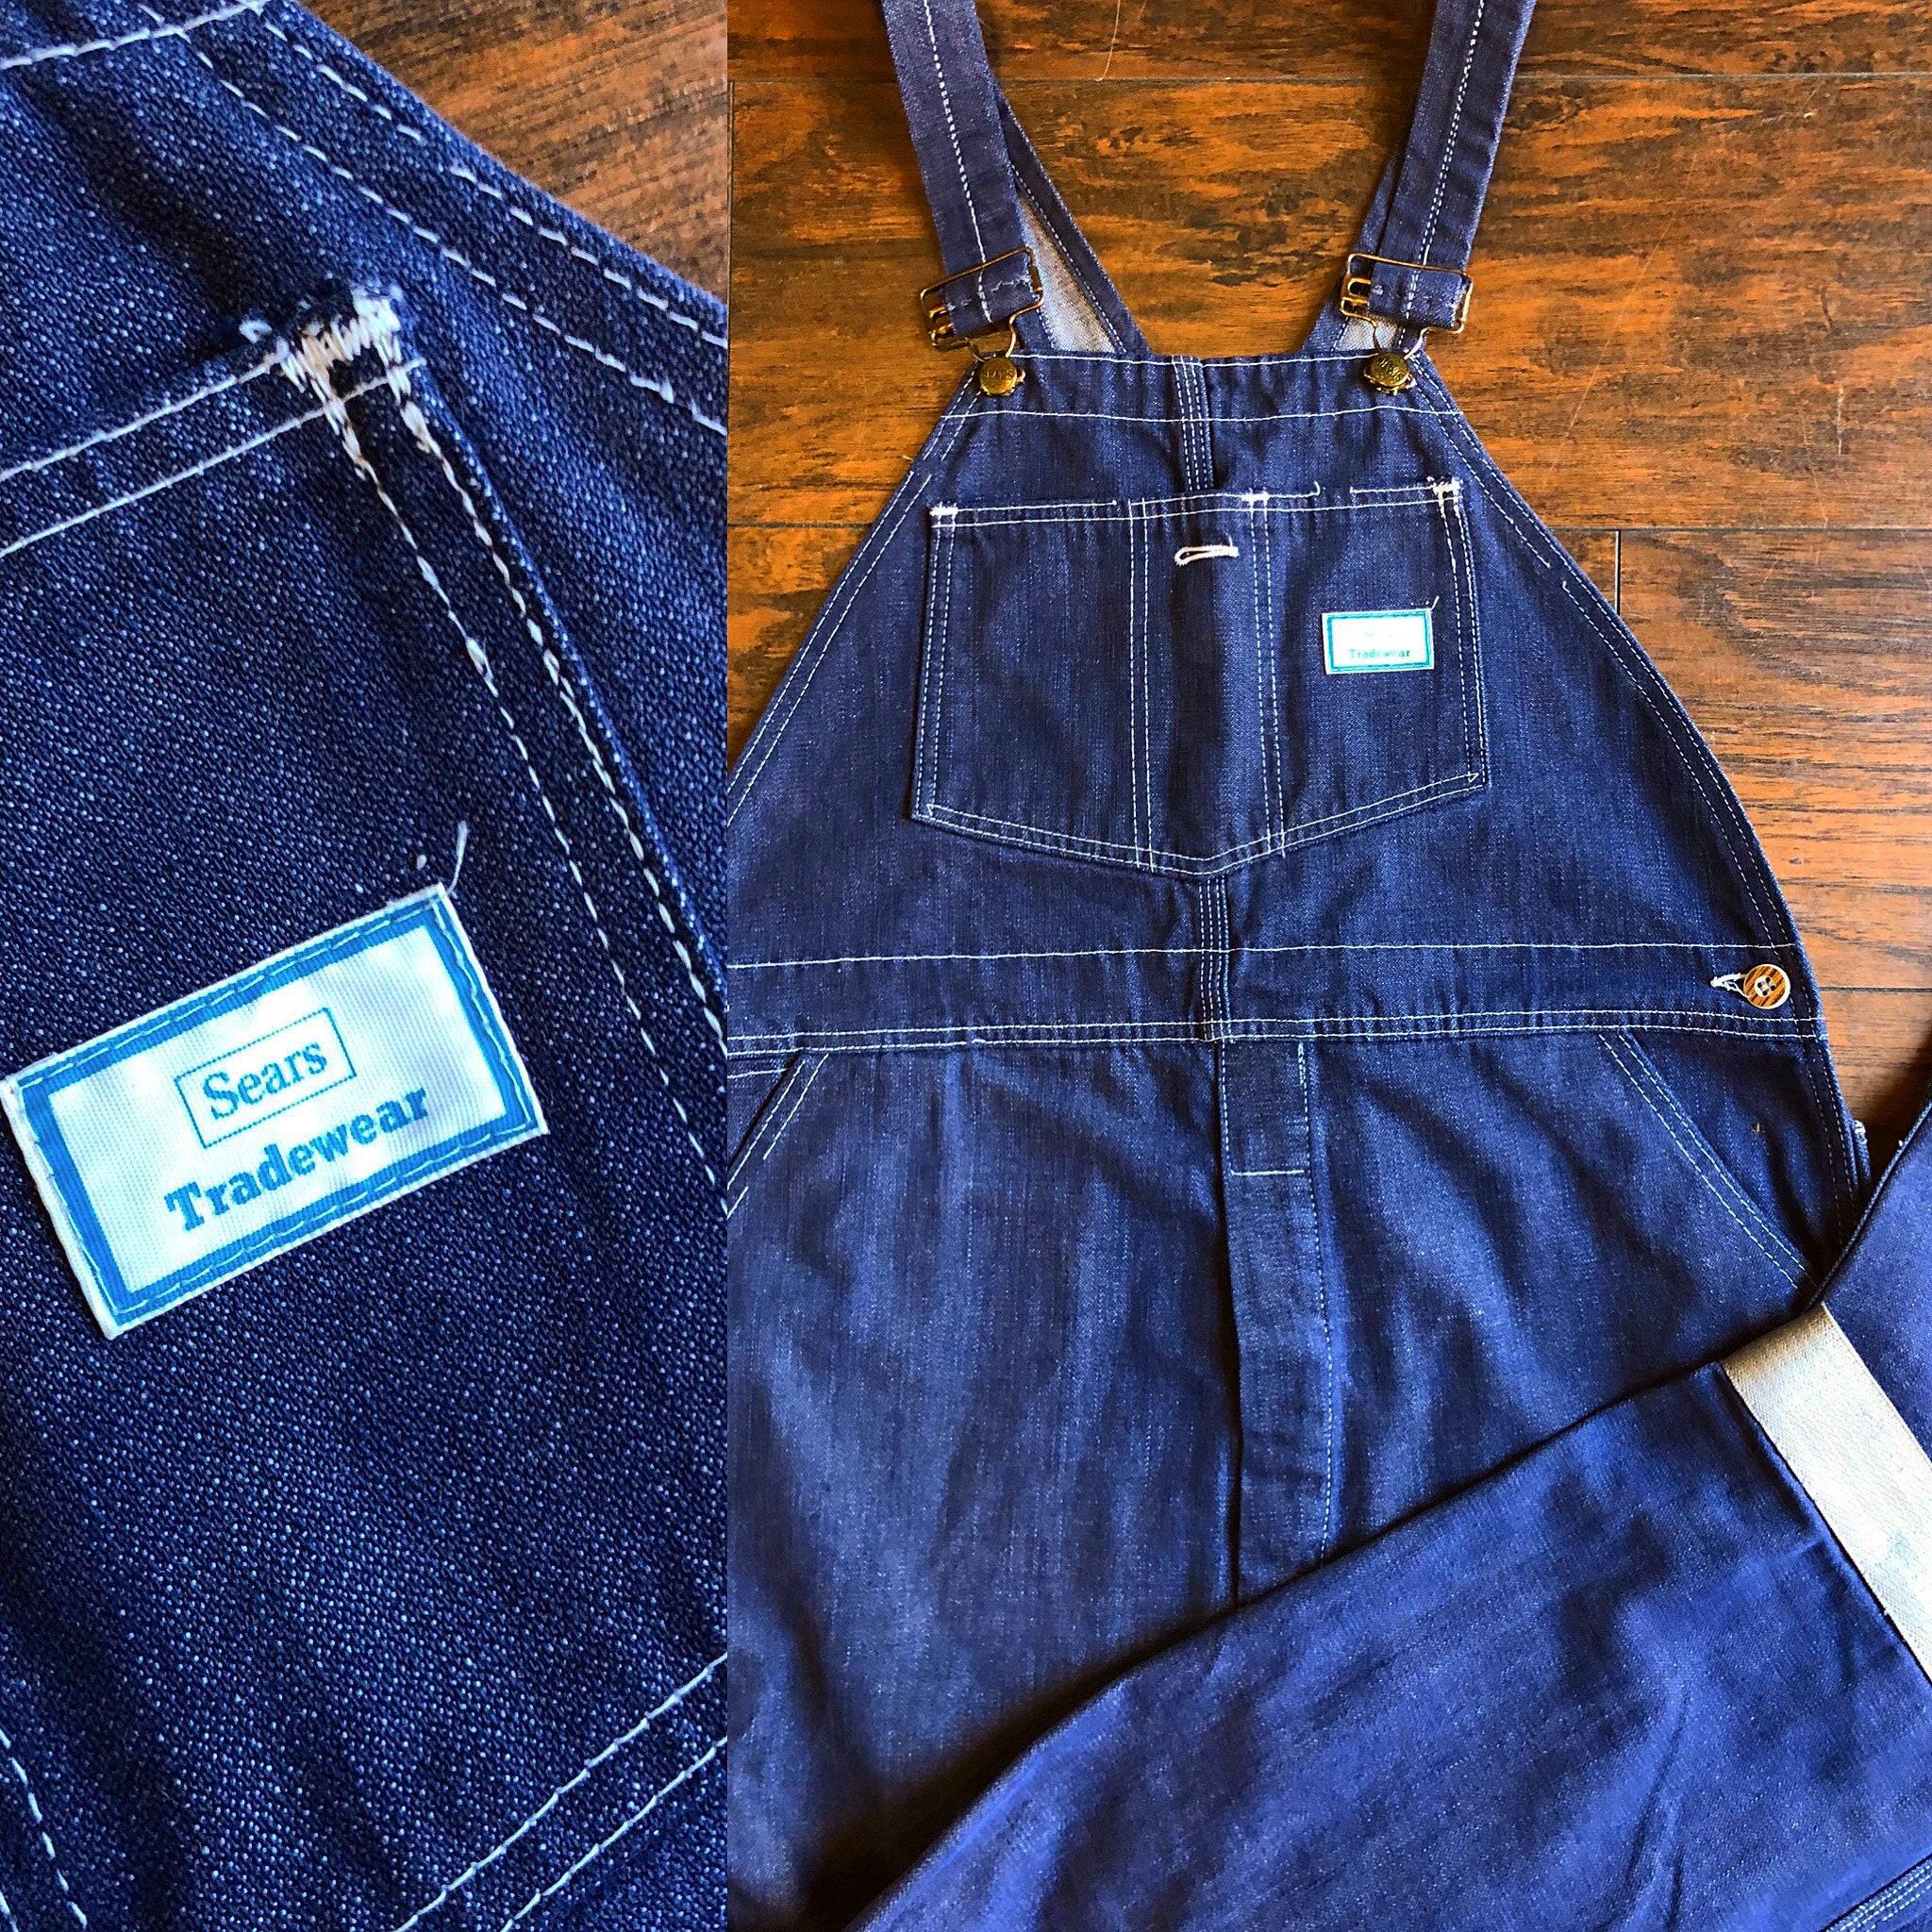 Vintage Overalls & Jumpsuits Authentic Vintage Rare Dark Blue Wash Denim Sears Tradewaear Brand Mens Overalls $0.00 AT vintagedancer.com